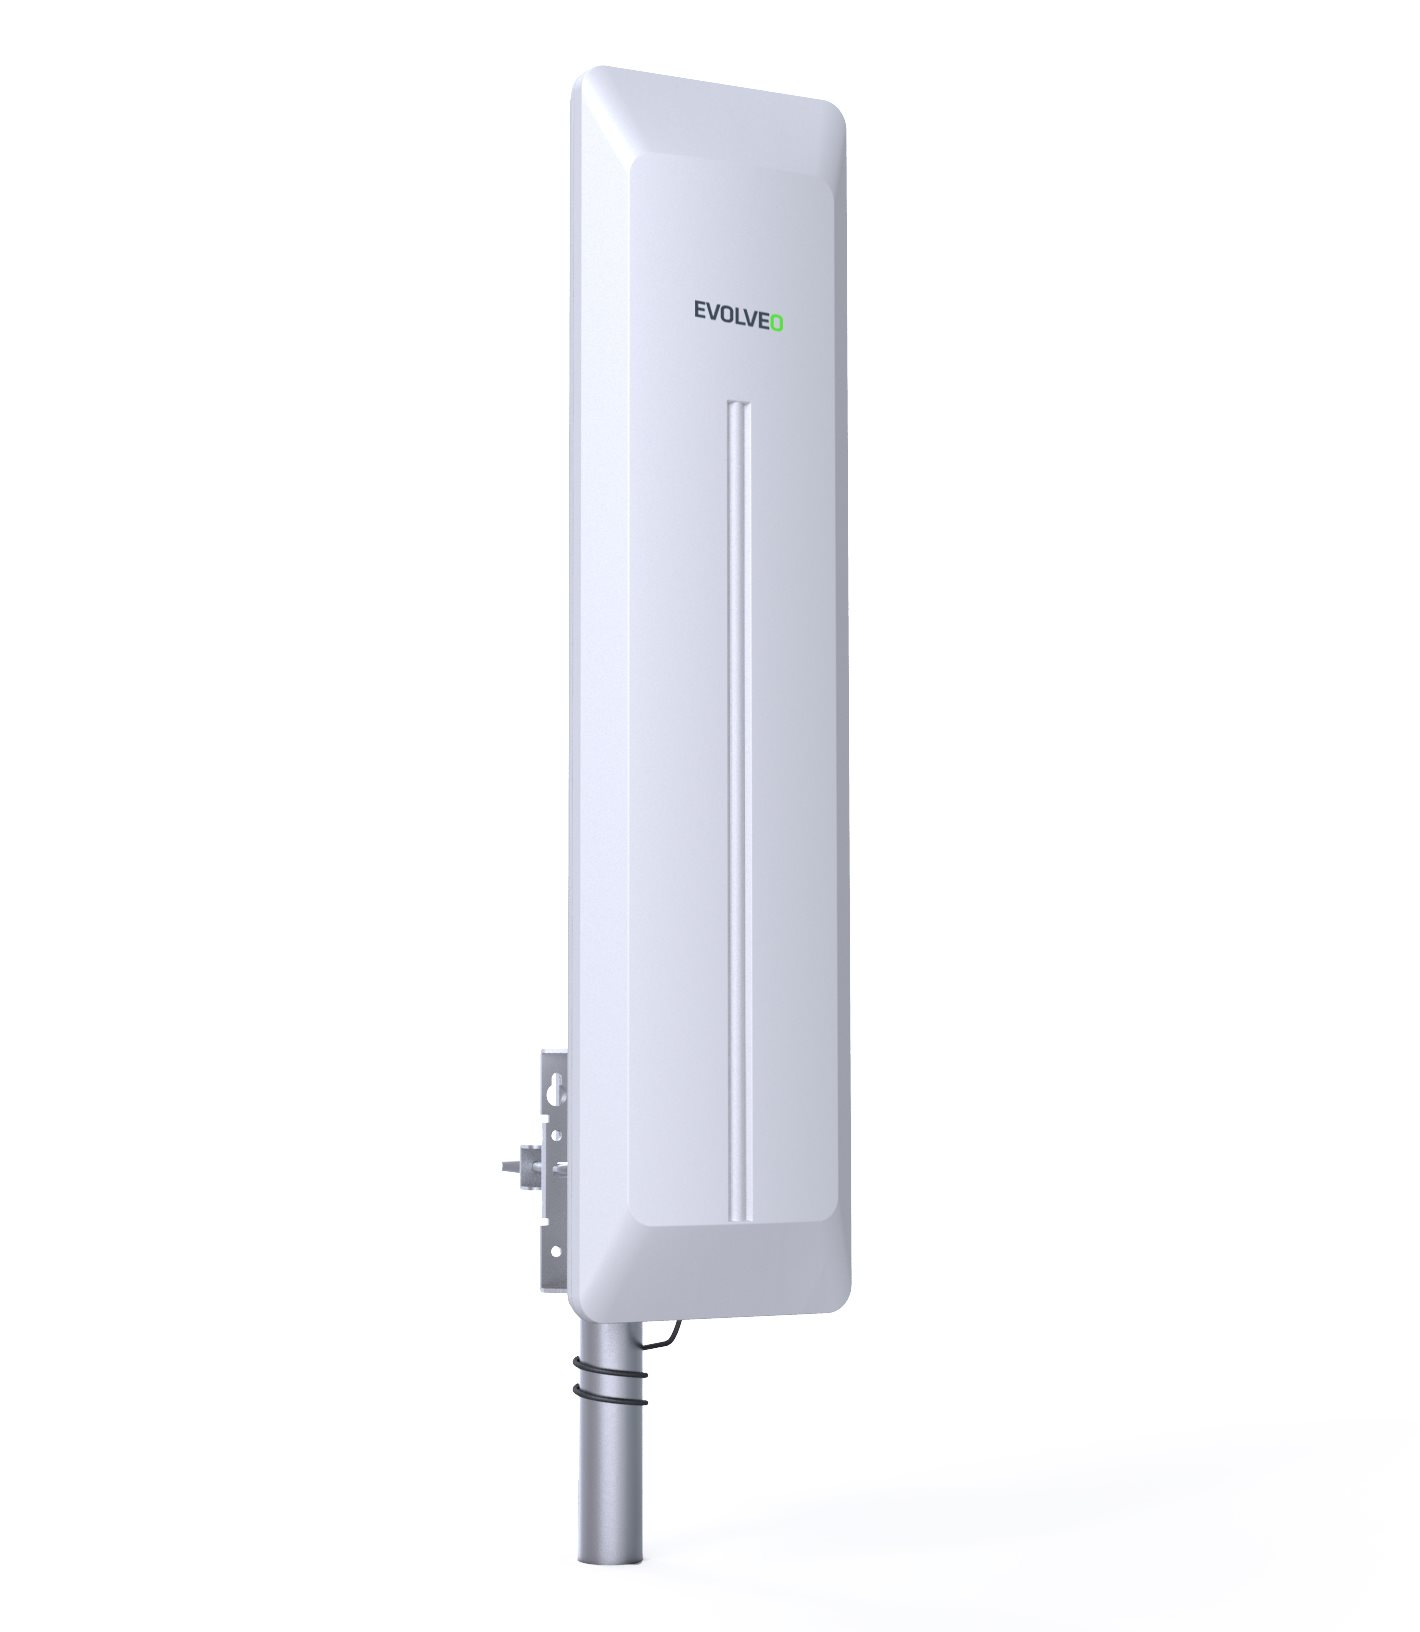 EVOLVEO HDO, aktív kültéri DVB-T/T2 antenna]